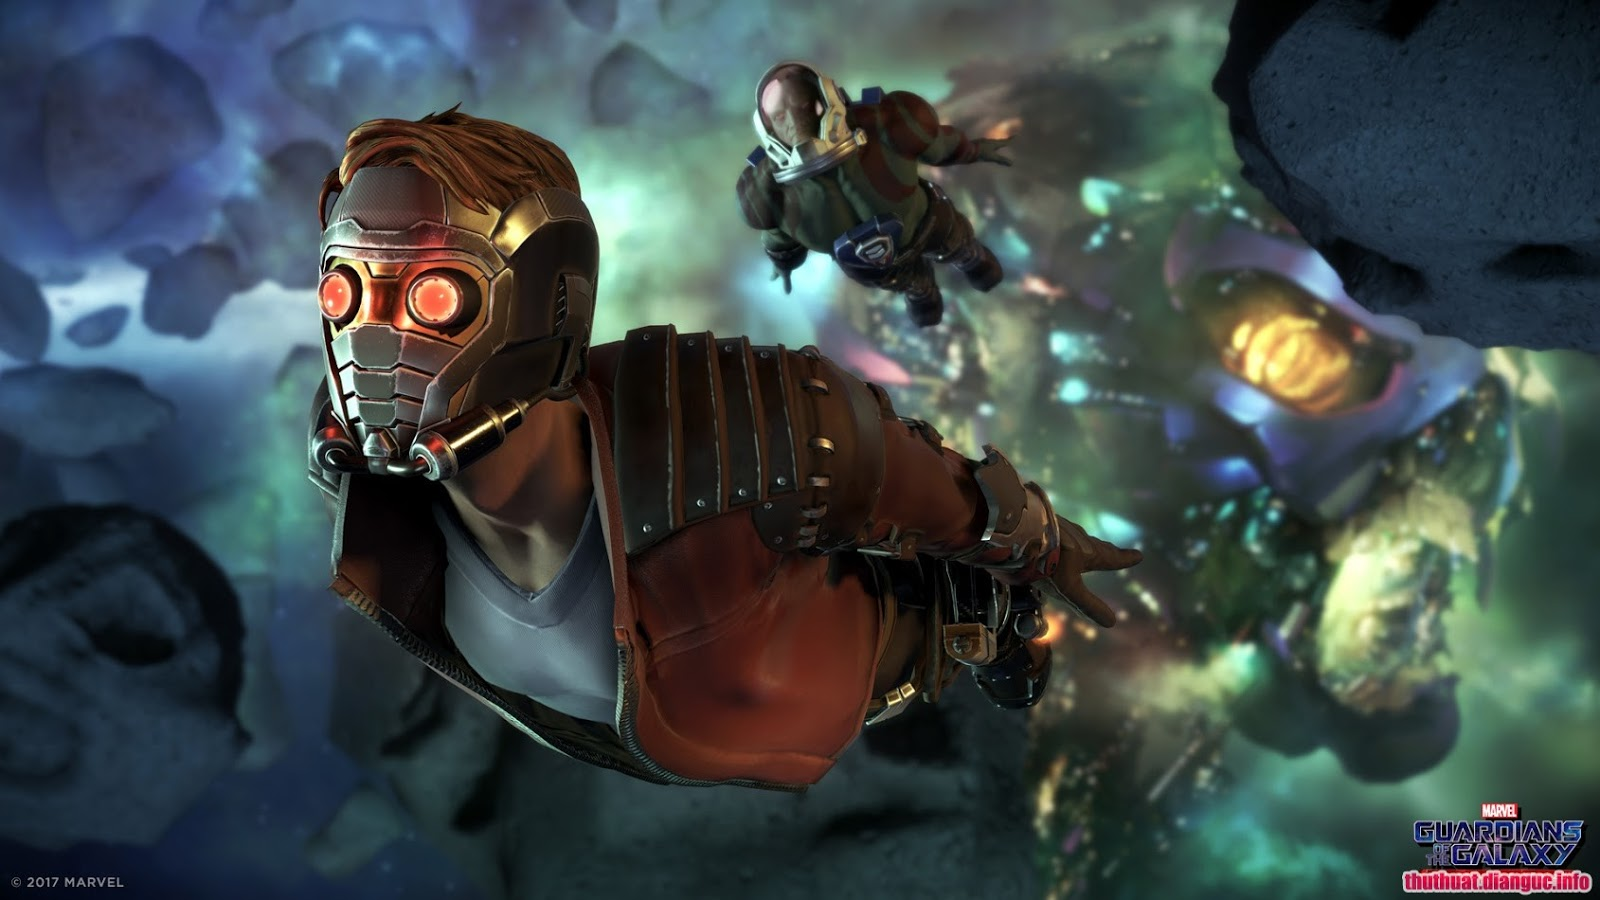 Download game phiêu lưu Marvels Guardians of the Galaxy Episode 1 , Marvel's Guardians of the Galaxy: The Telltale Series Free Download